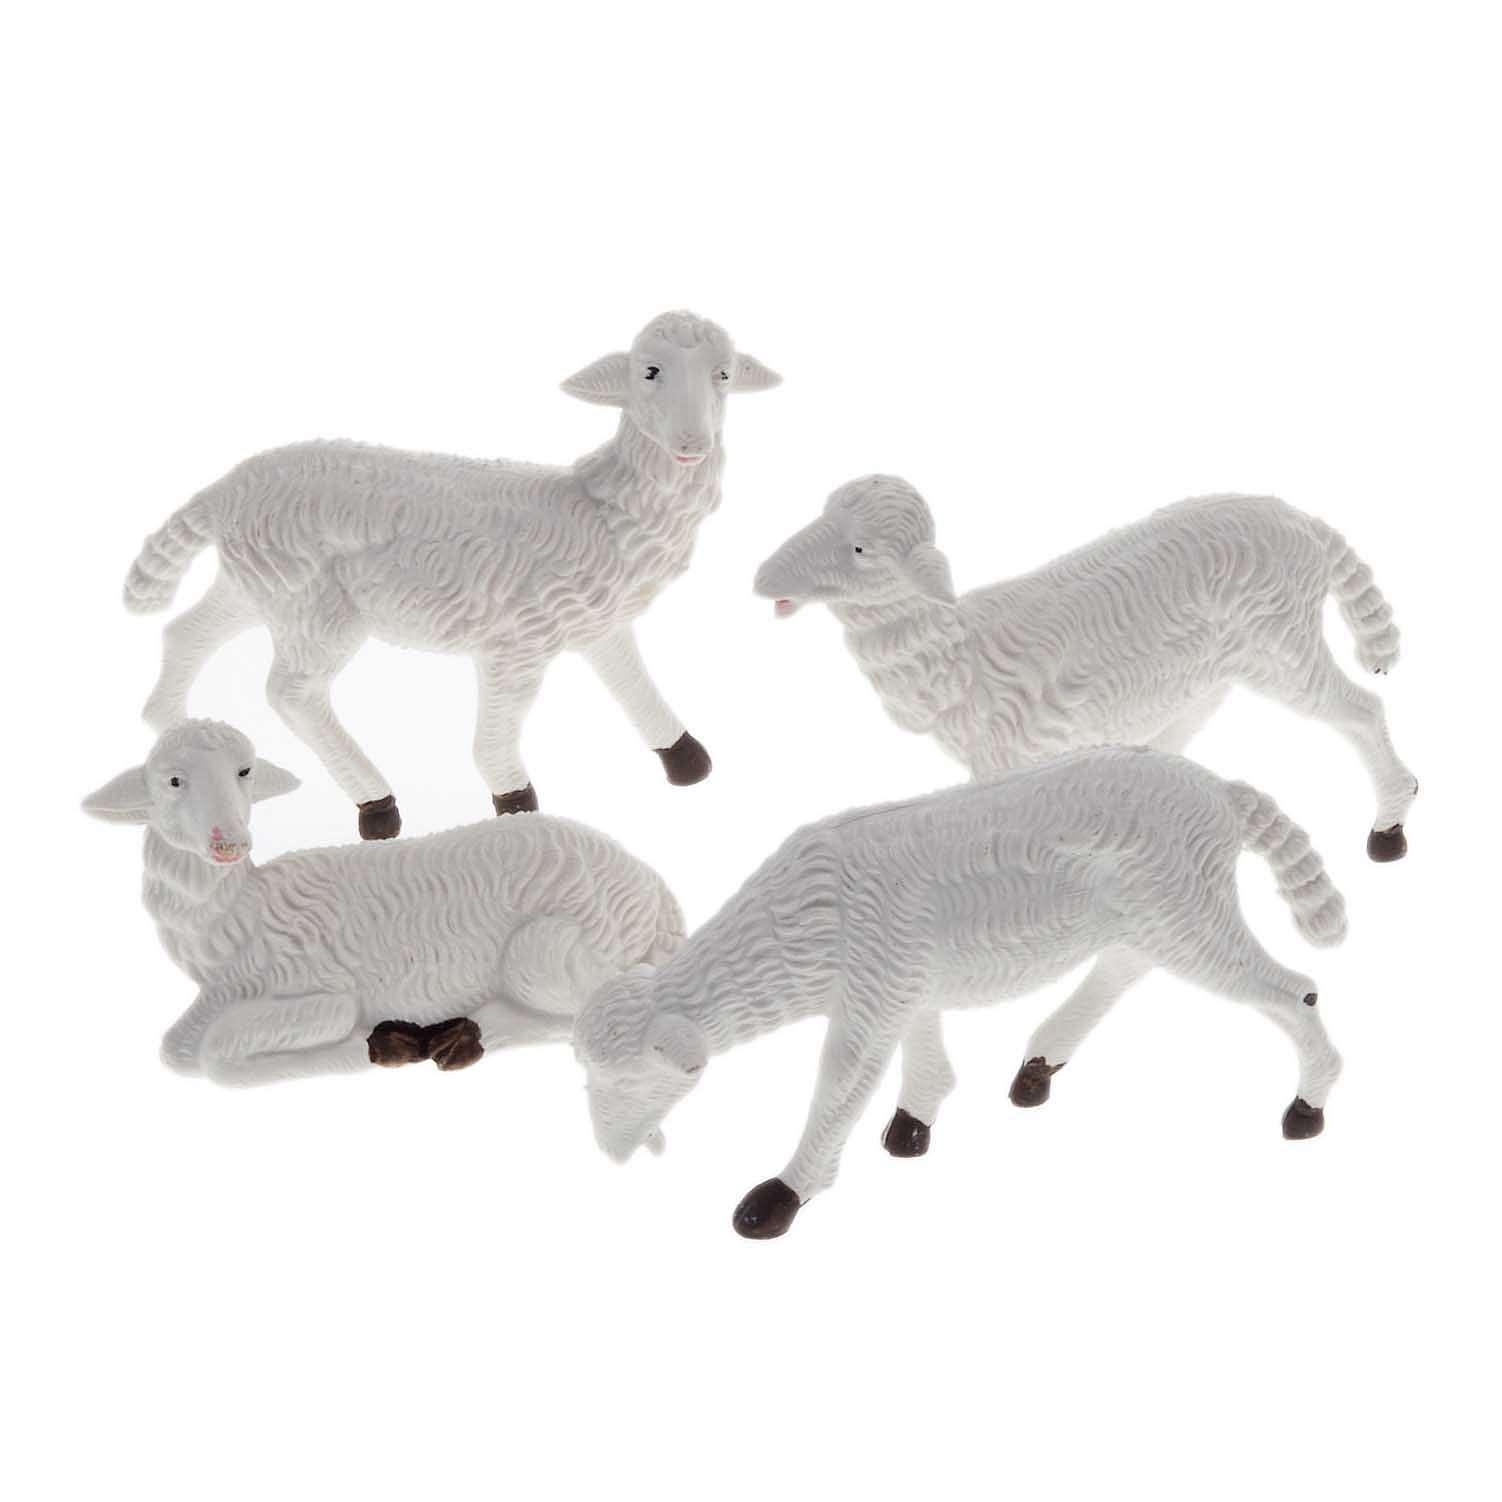 Pecore presepe plastica bianca 4 pz. 16 cm 3